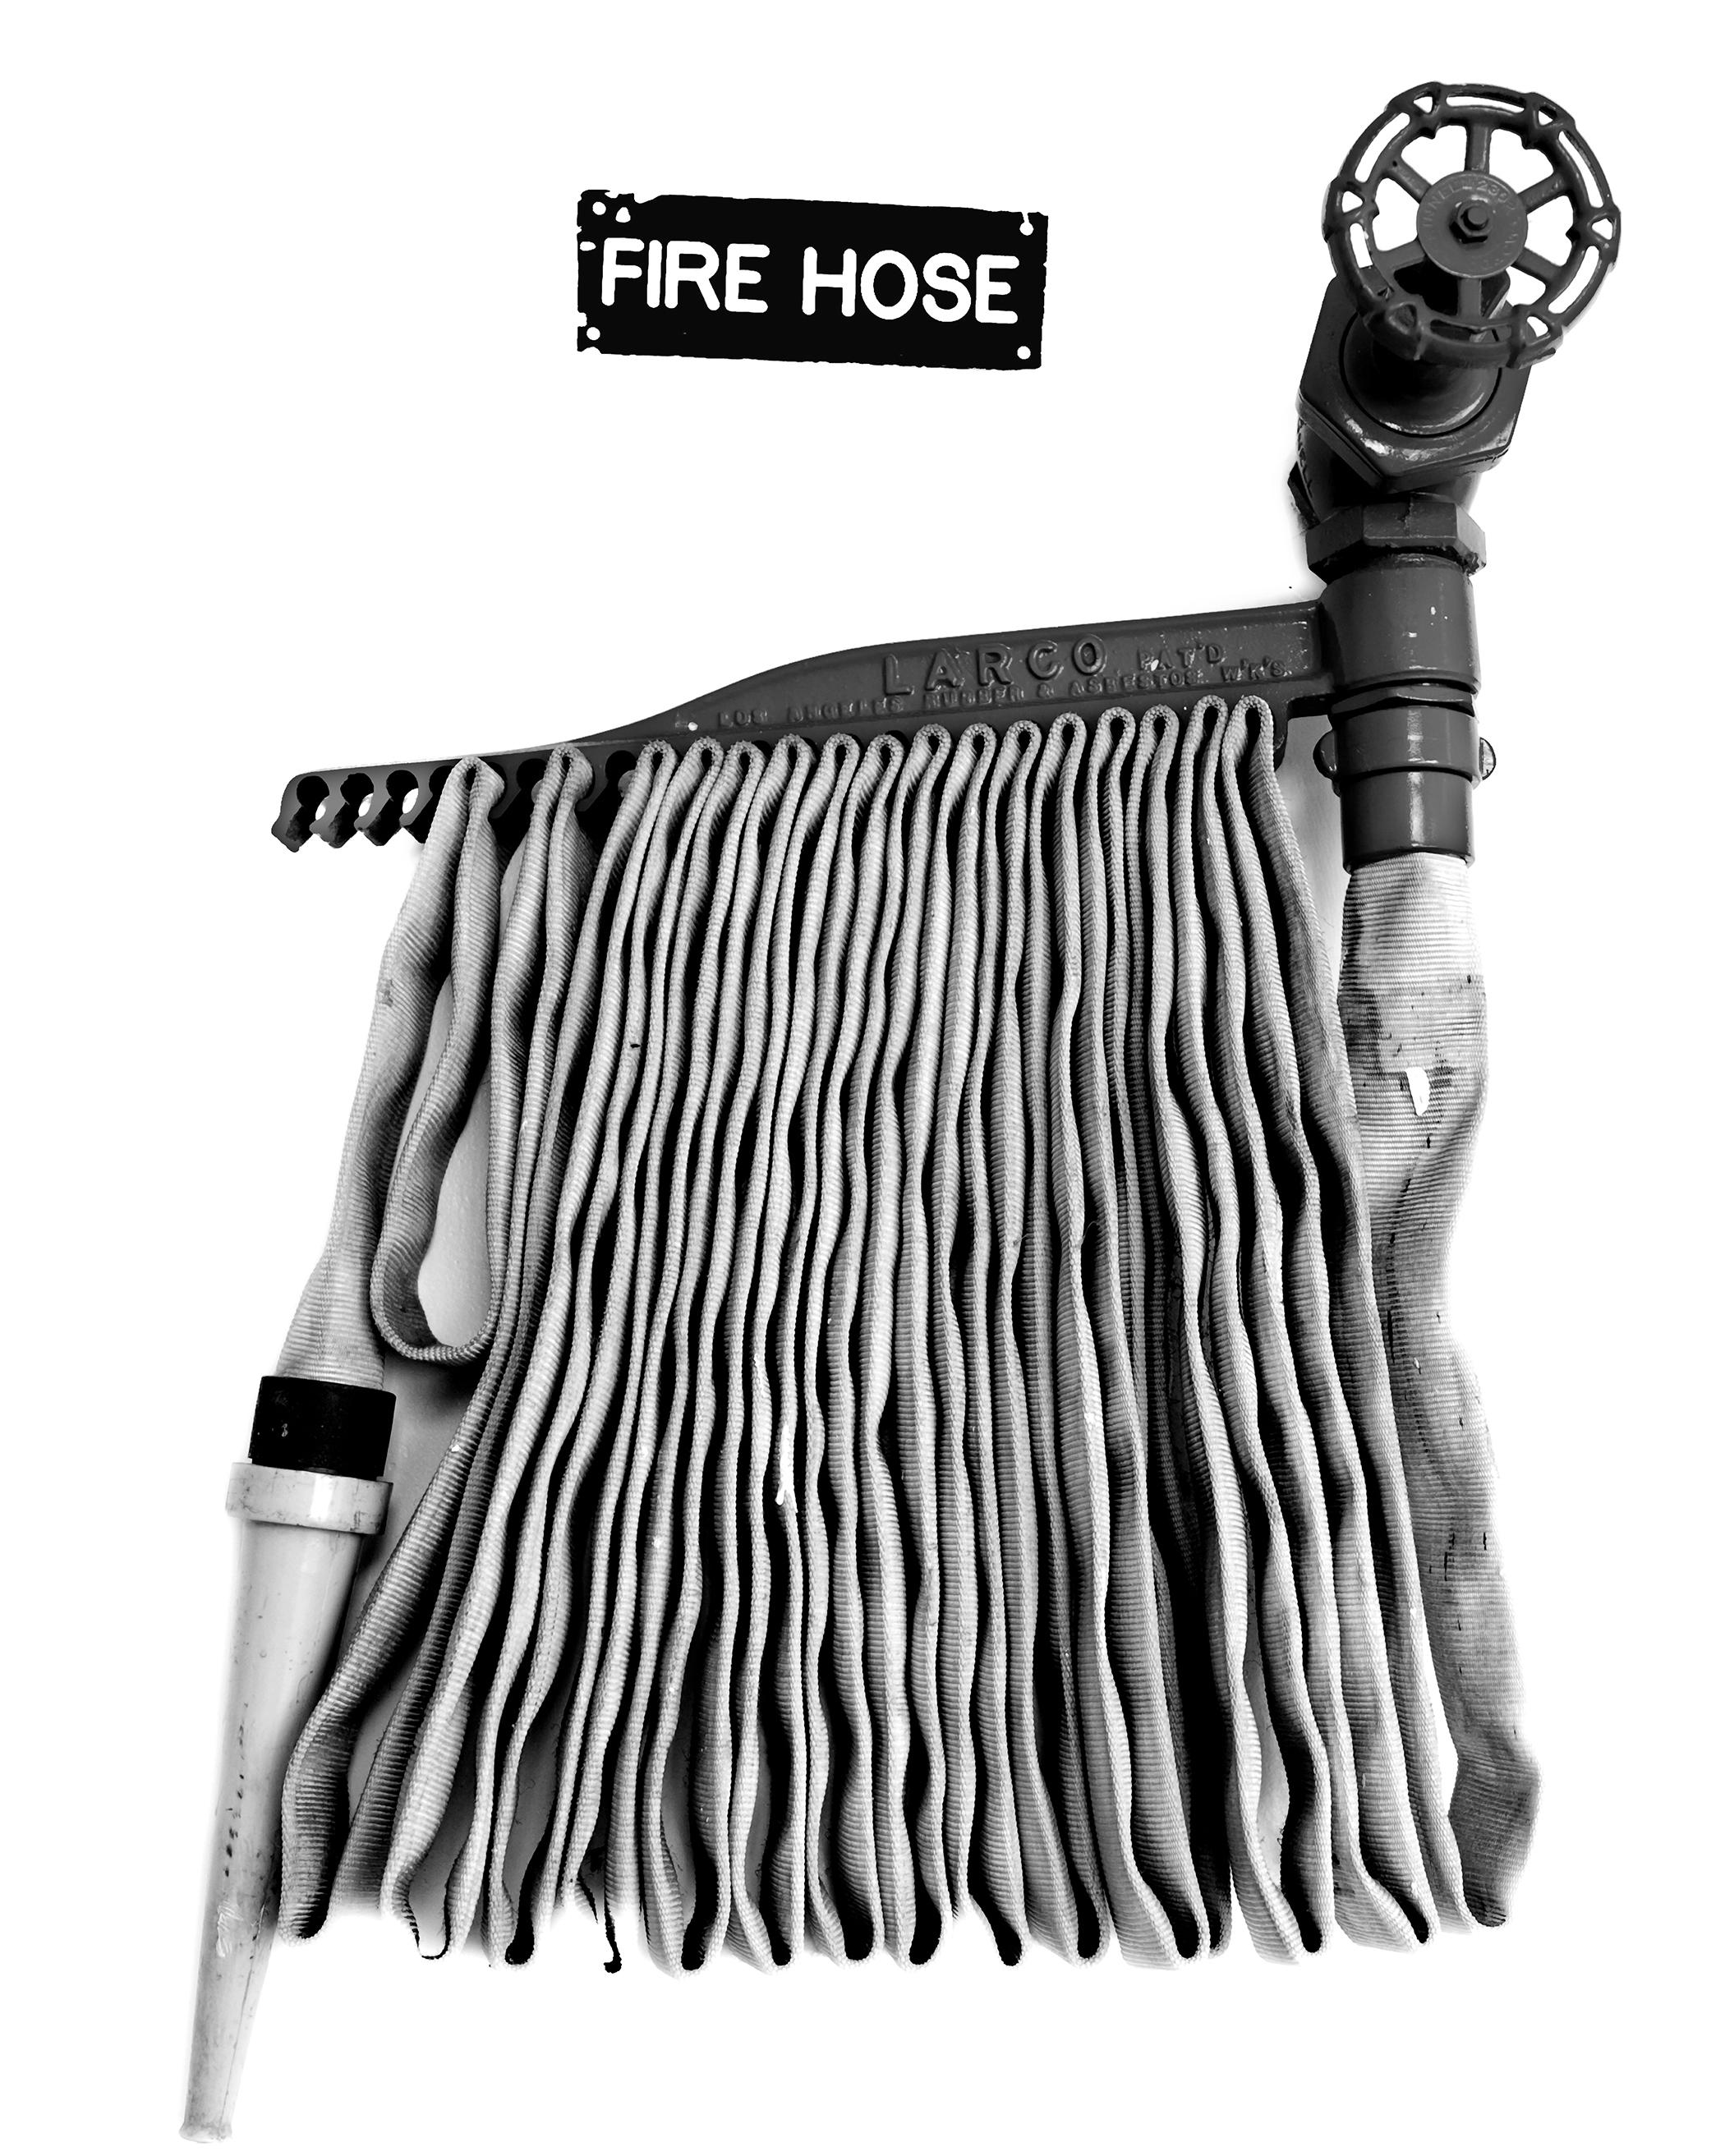 Firehose, Los Angeles, CA, 2013.jpg